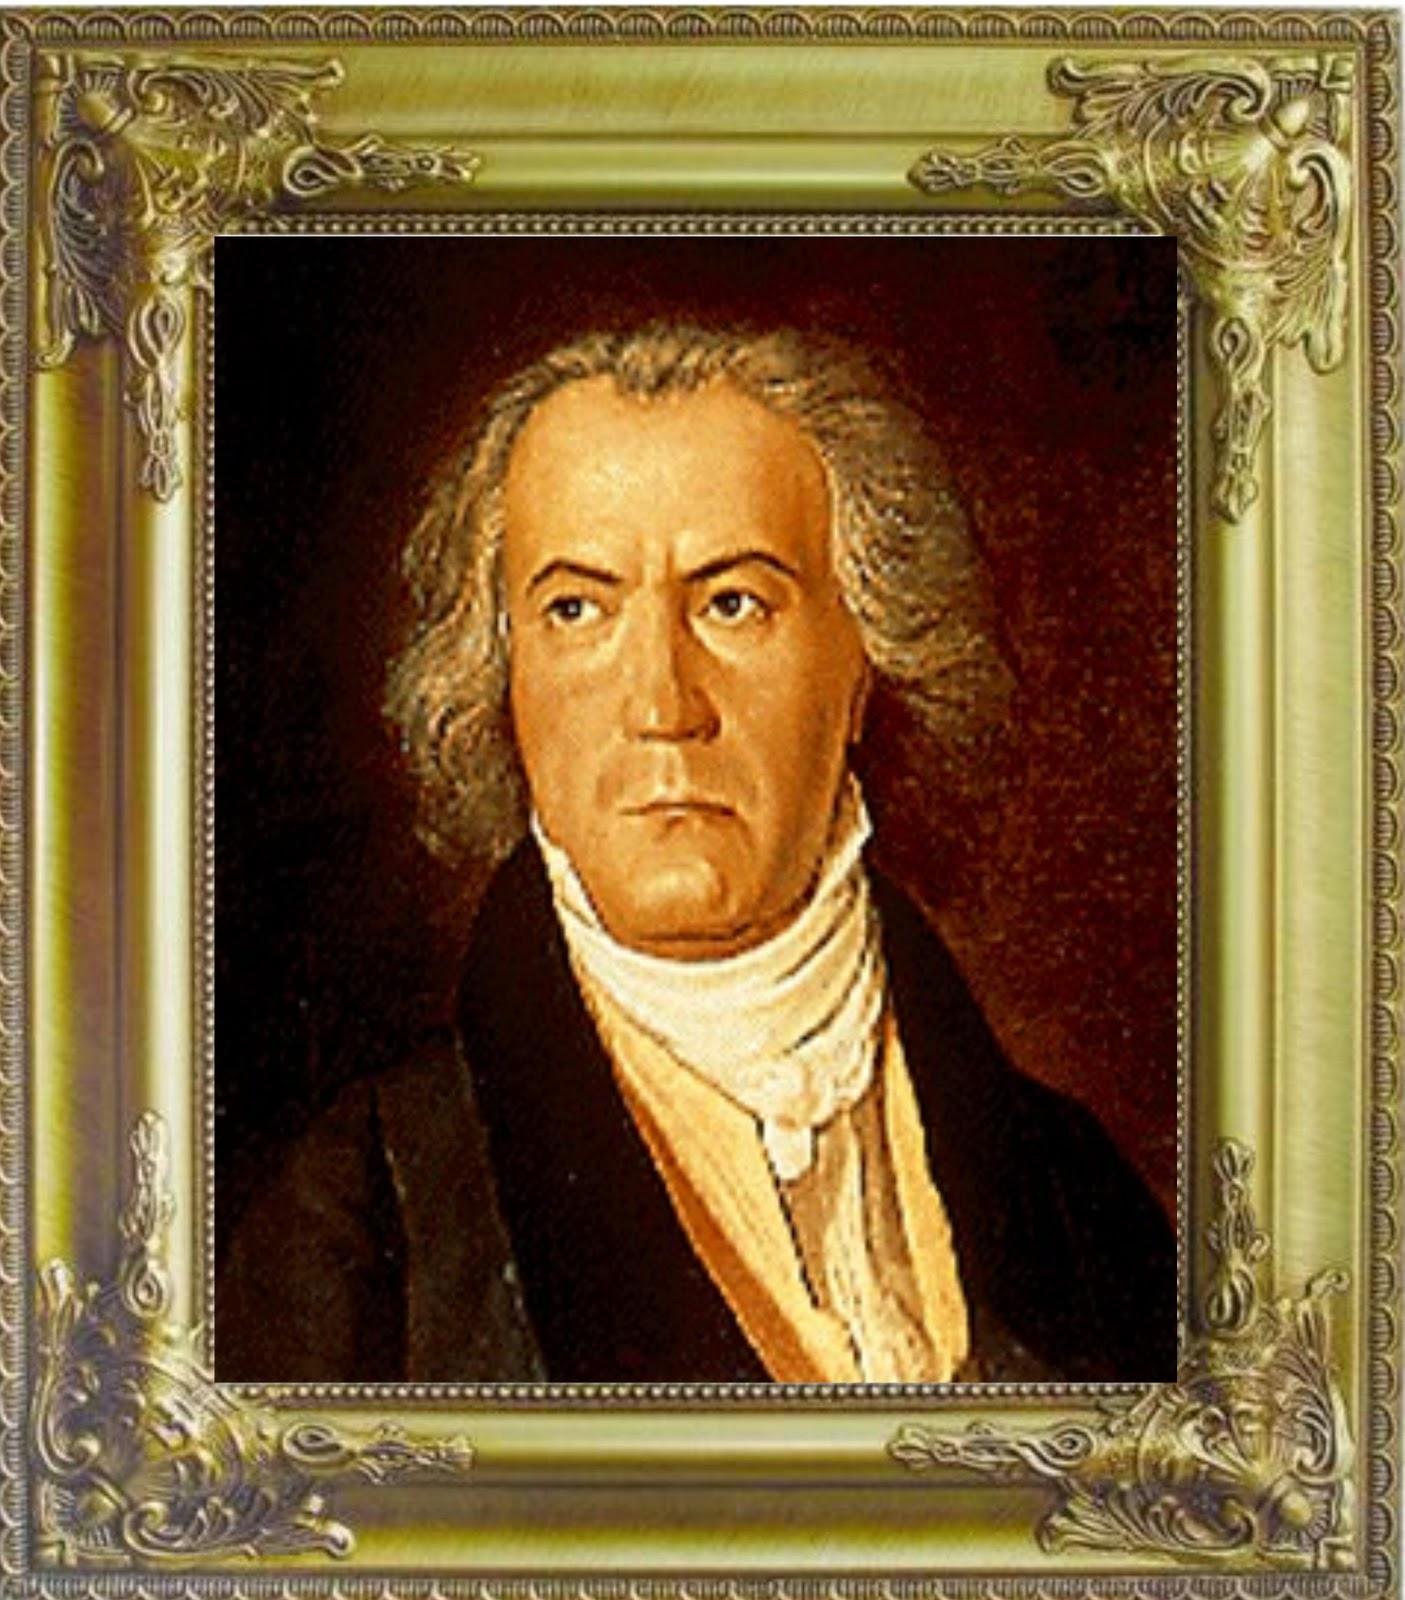 beethoven sonata no 27 Beethoven, ludwig van bonn 1770 - vienna 1827 piano sonatas : ludwig van beethoven on kunst der fuge » midi | sonate no 14 in c sharp minor, op 27 no 2.